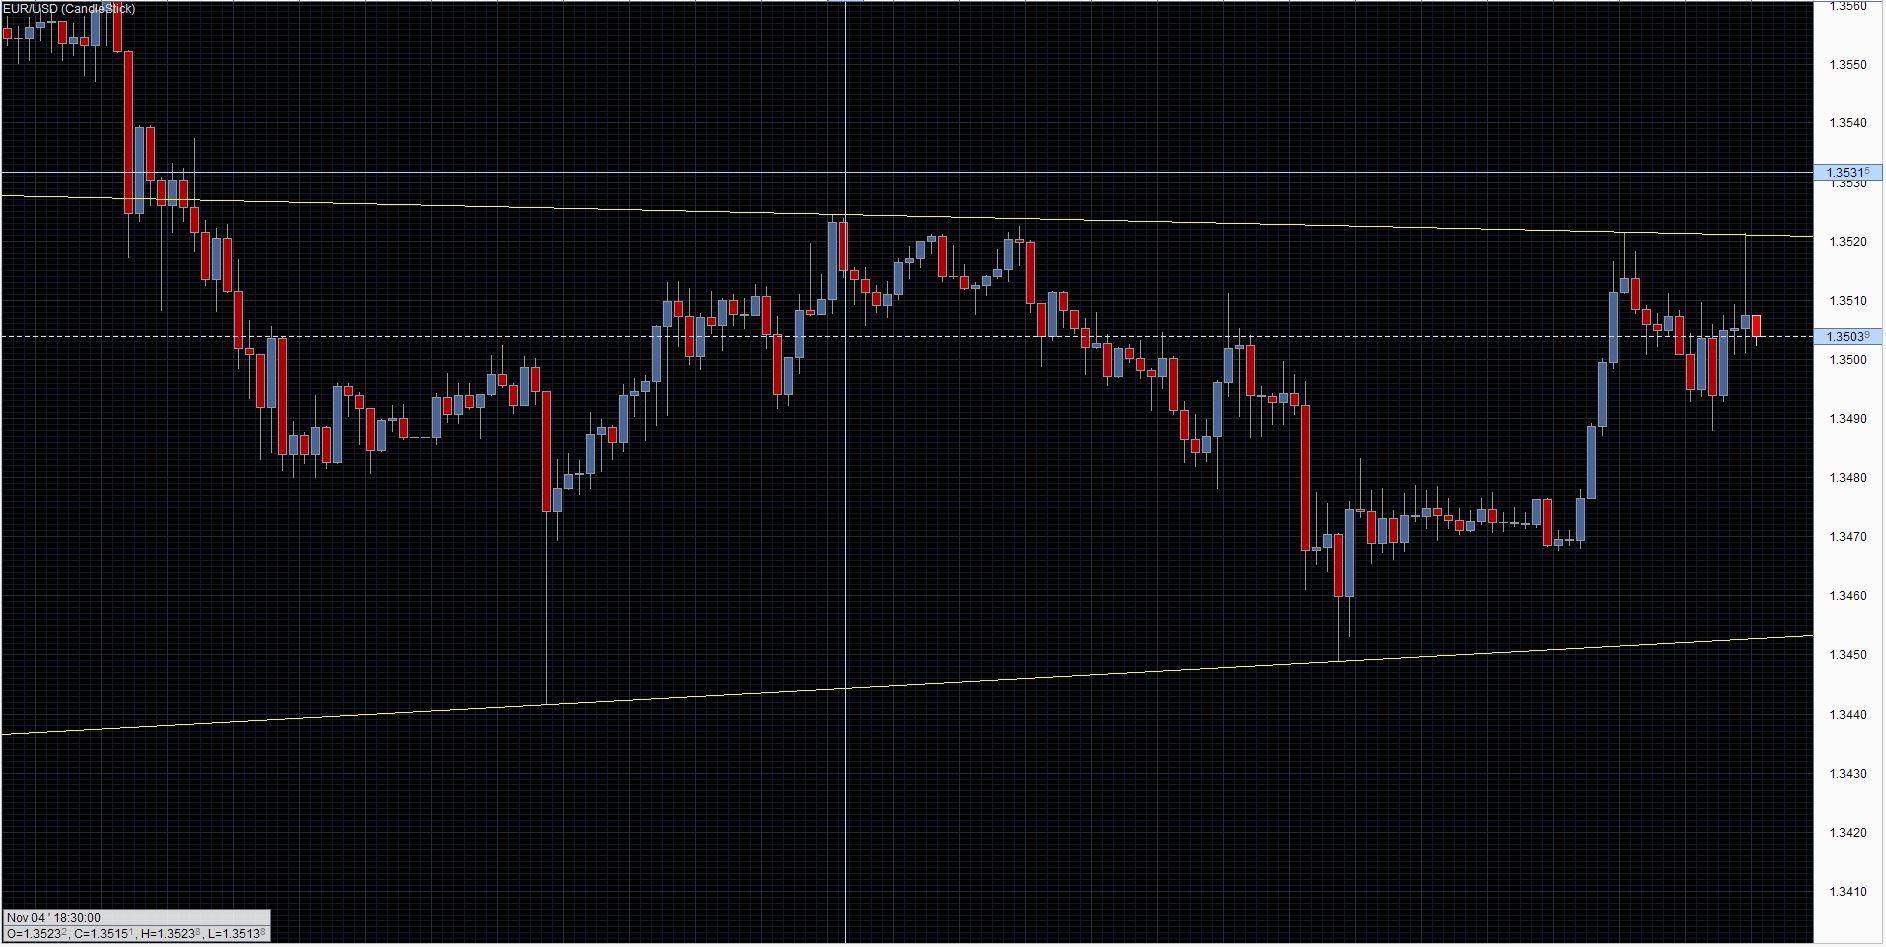 EUR/USD Chart 06/11/2013